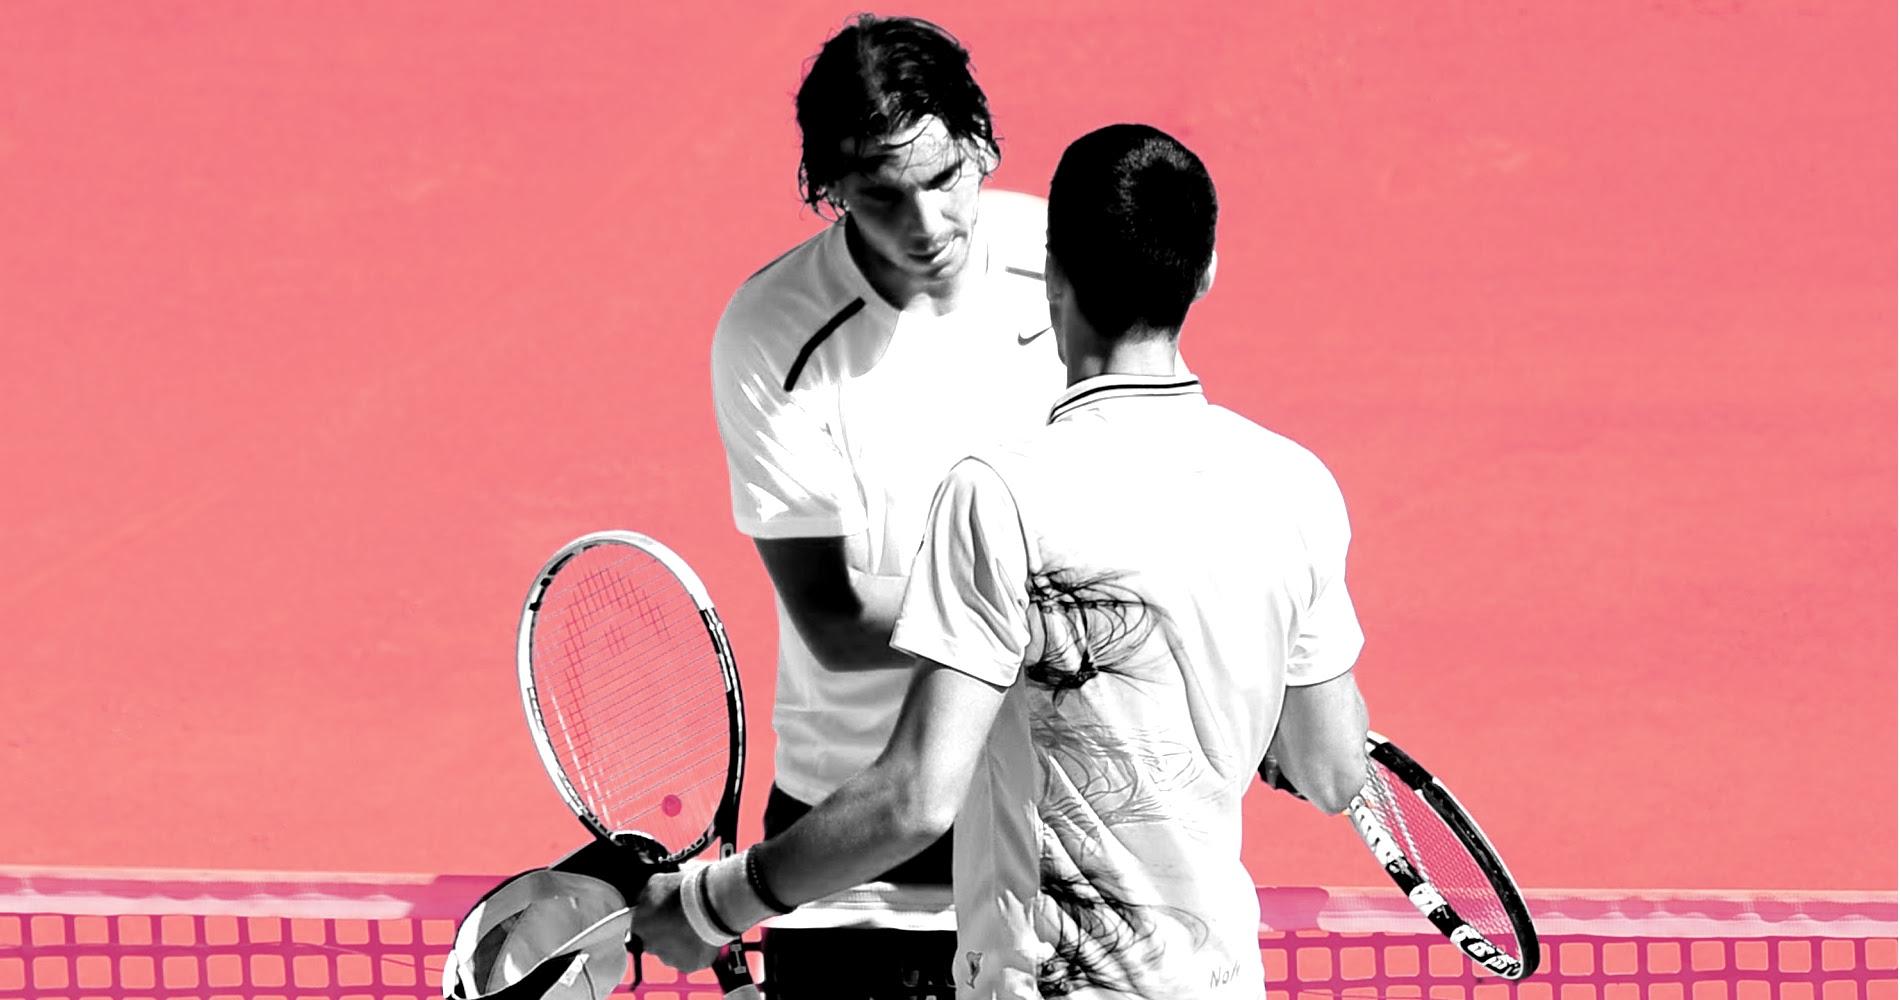 Rafael Nadal & Novak Djokovic, On This Day